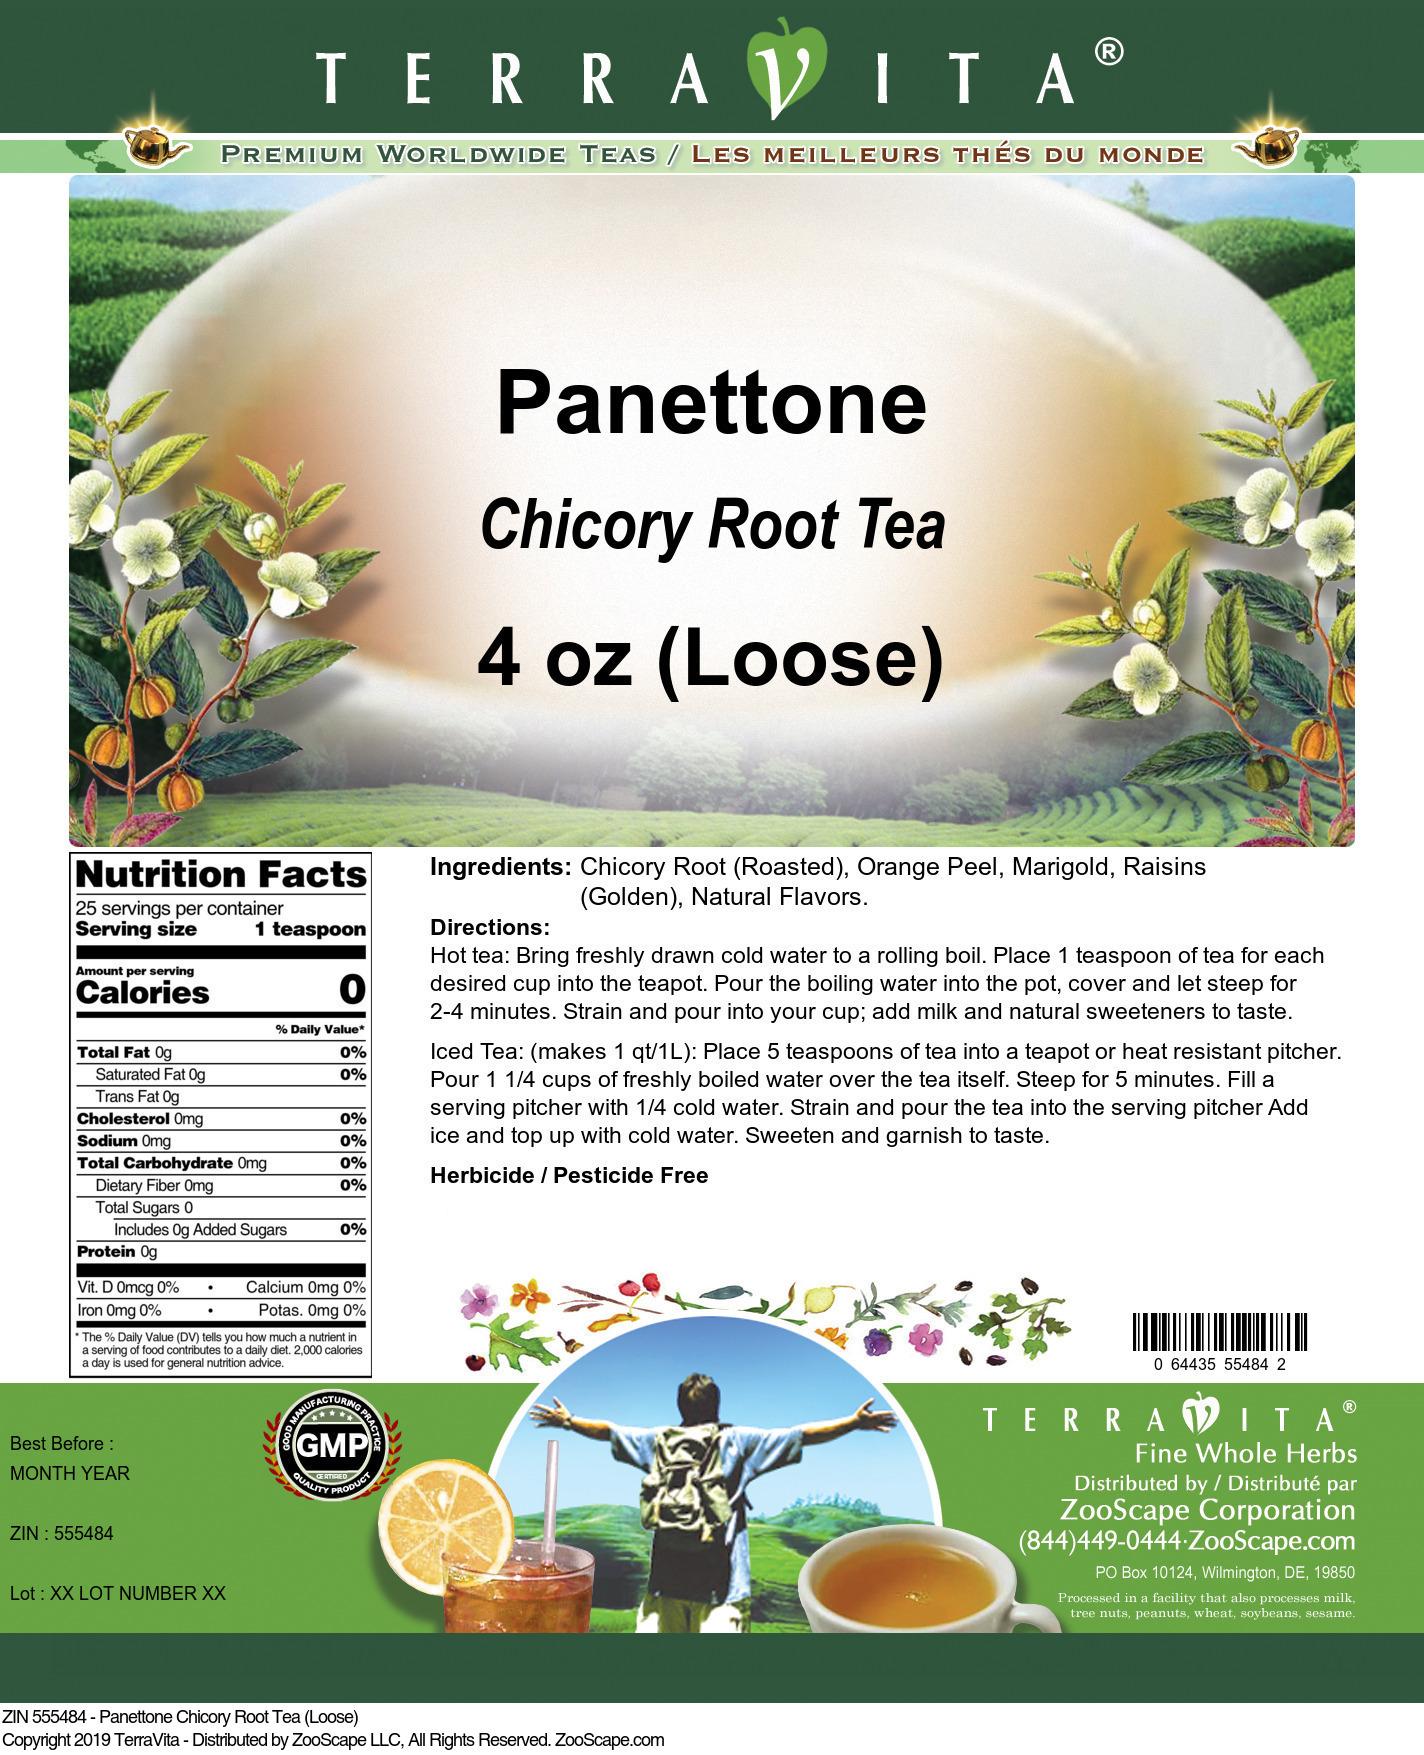 Panettone Chicory Root Tea (Loose)